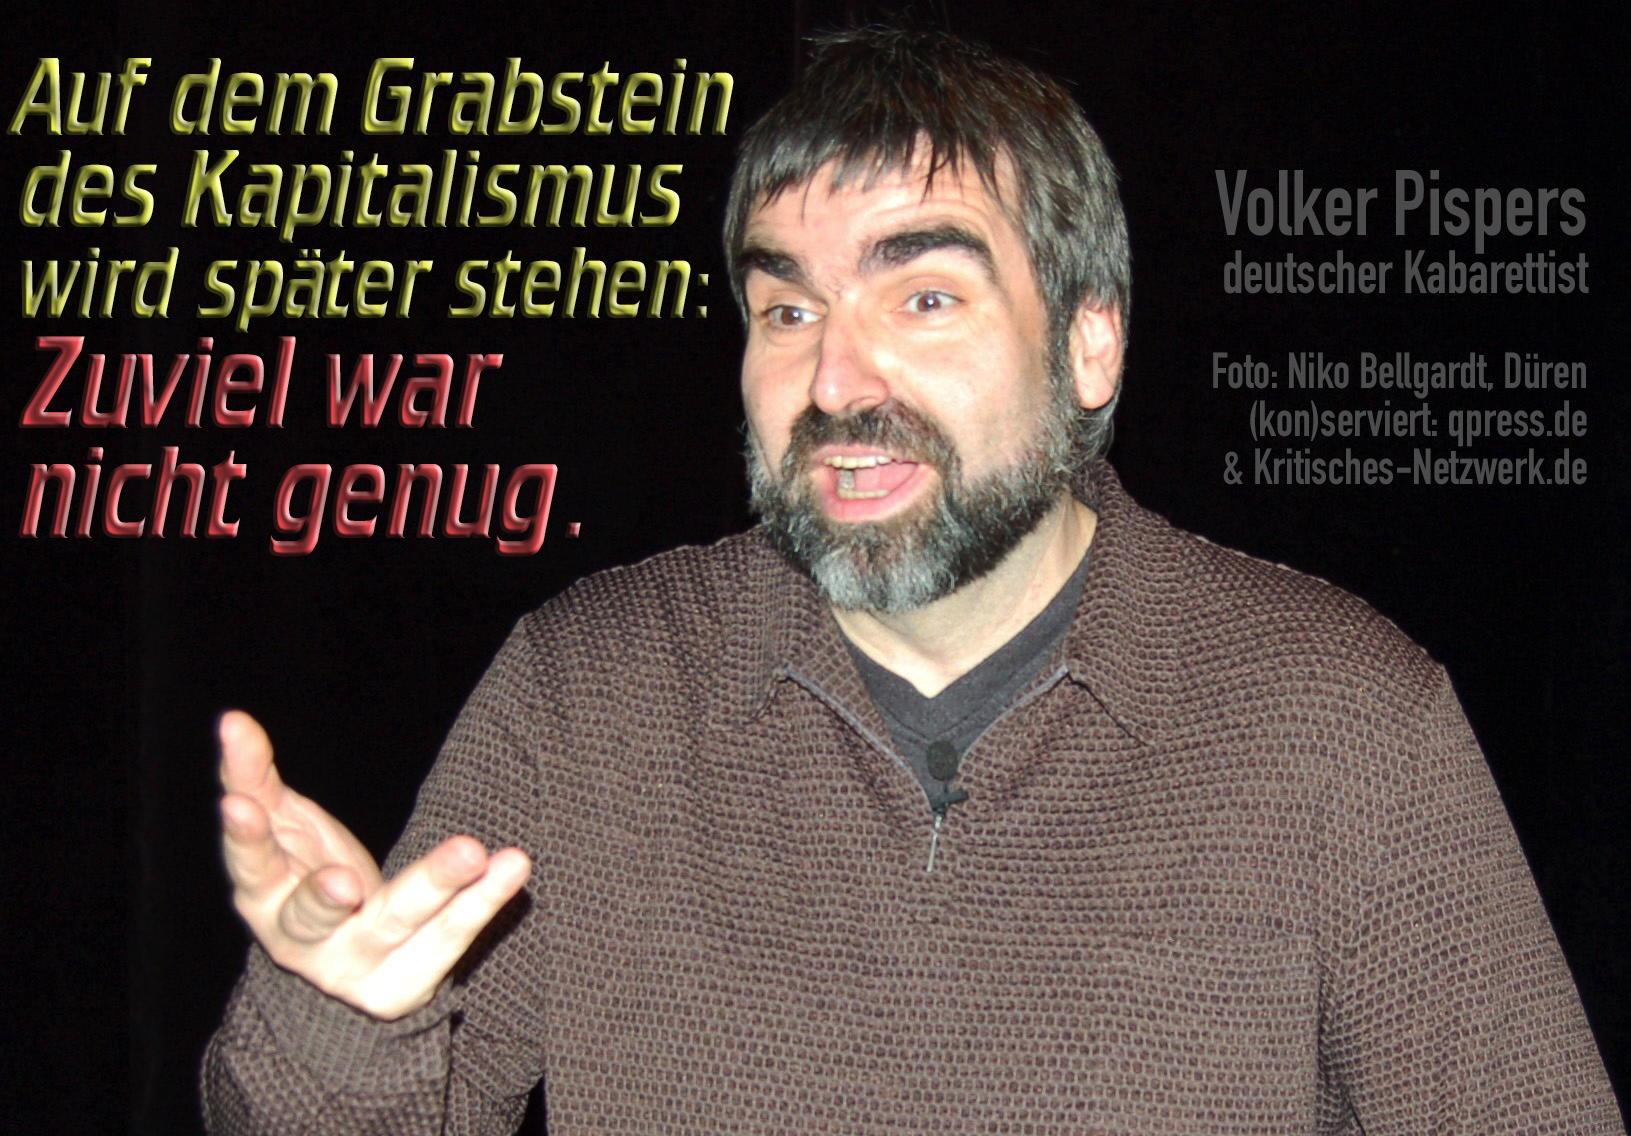 http://www.kritisches-netzwerk.de/sites/default/files/u17/Volker_Pispers_Grabstein_Kapitalismus_politischer_Kabarettist_Kabarett_schwarzer_Humor_Kapitalismuskritik_bis_neulich_Gesellschaftskritik_political_satire_black_comedy_capitalism.jpg